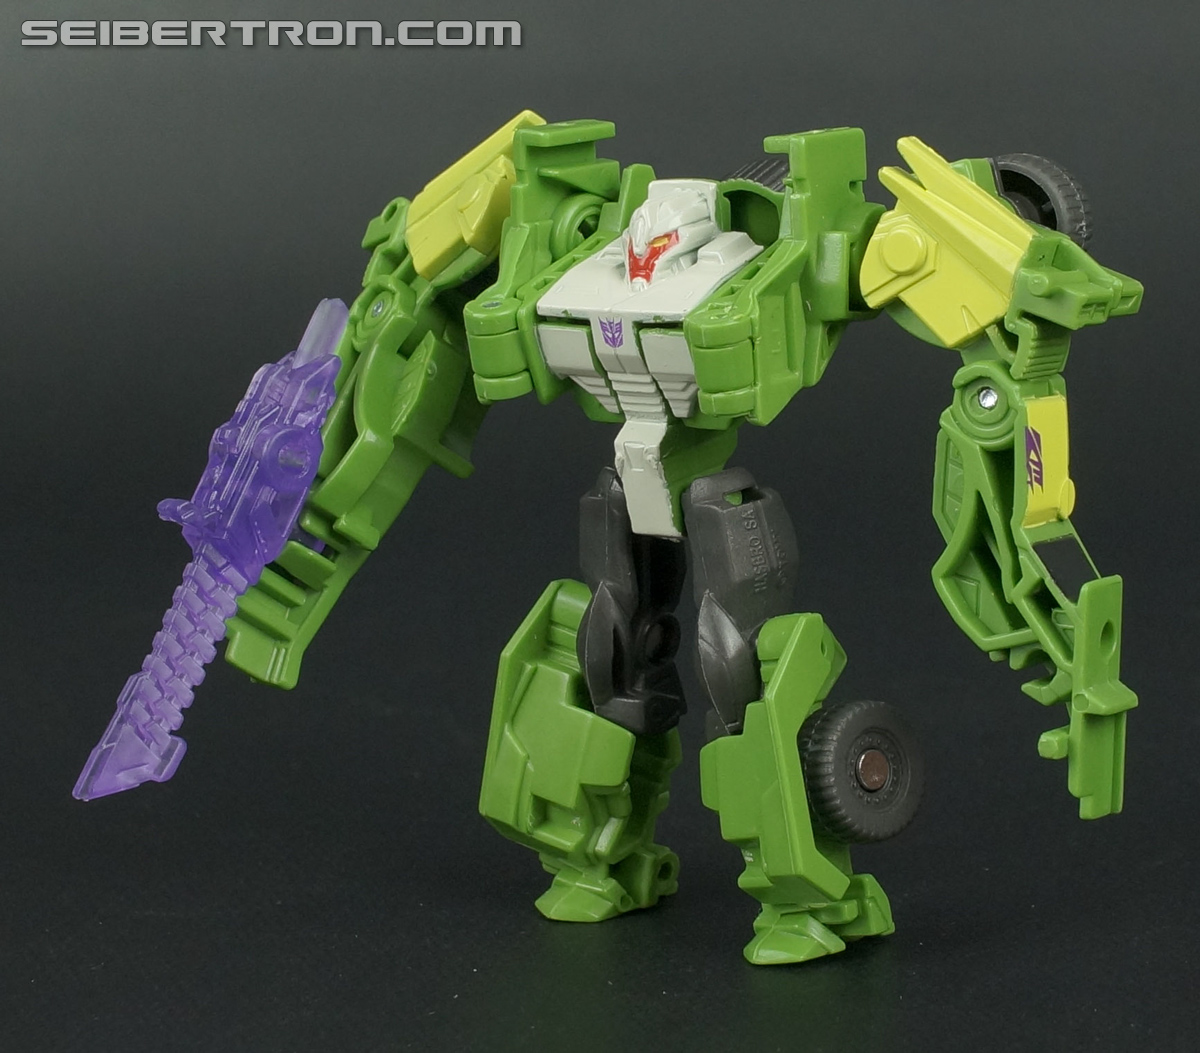 Transformers Prime Beast Hunters Cyberverse Breakdown (Apex Hunter Armor) (Image #55 of 96)